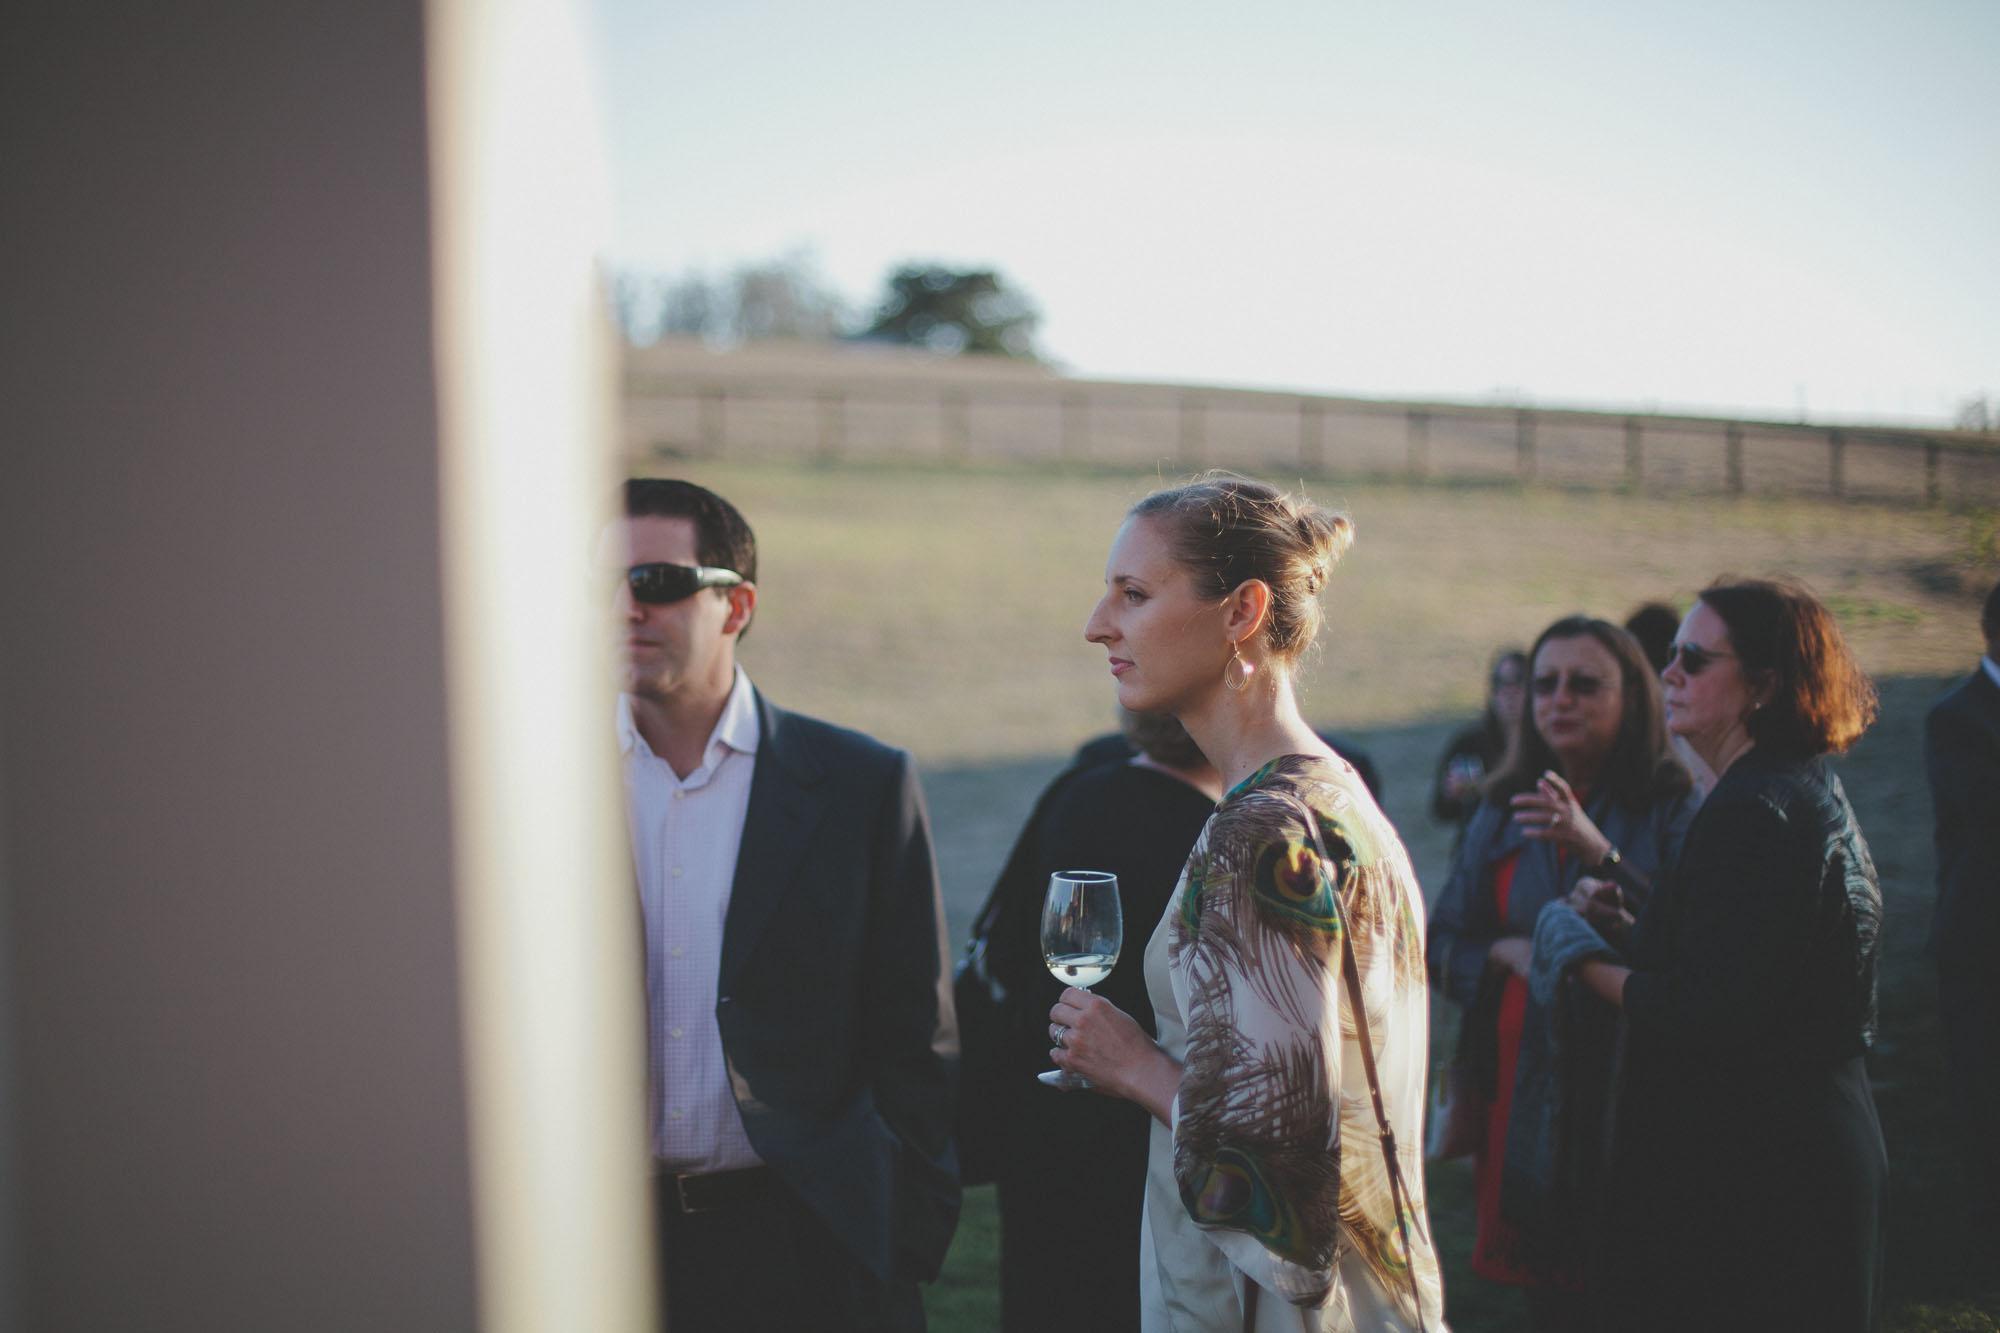 Gretchen_Gause_Petaluma_Olympias_Valley_Wedding_Photo-187.jpg